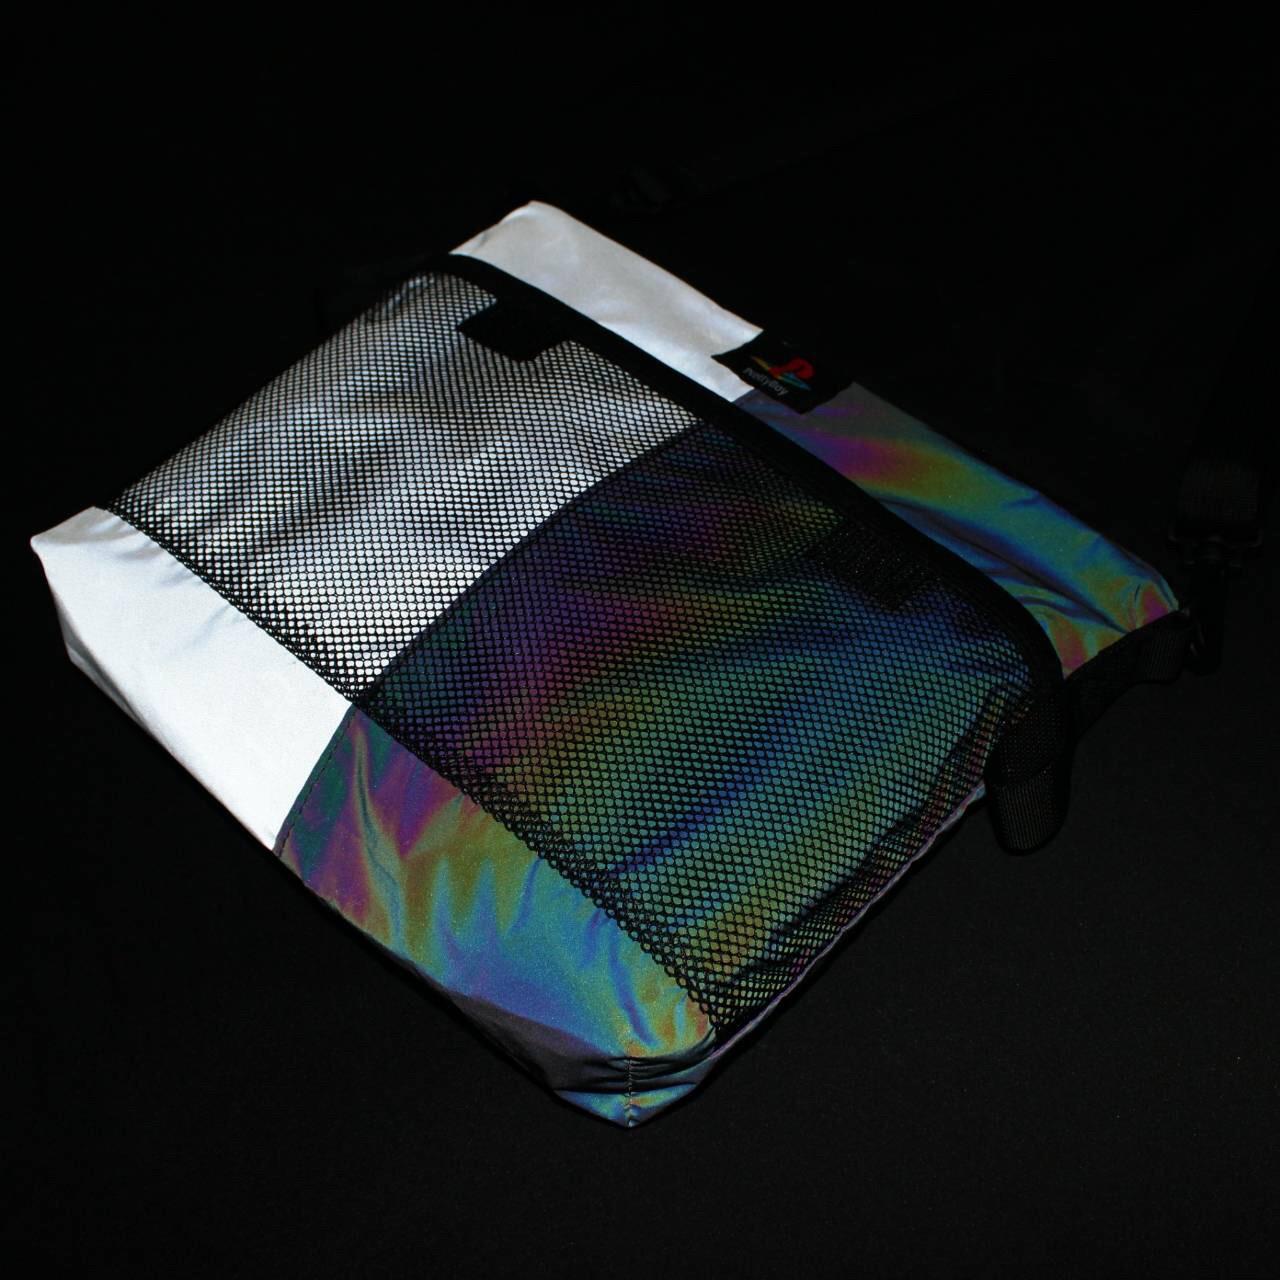 PRETTYBOYGEAR RAINBOW HALF REFLECT SACOCHE BAG 3M